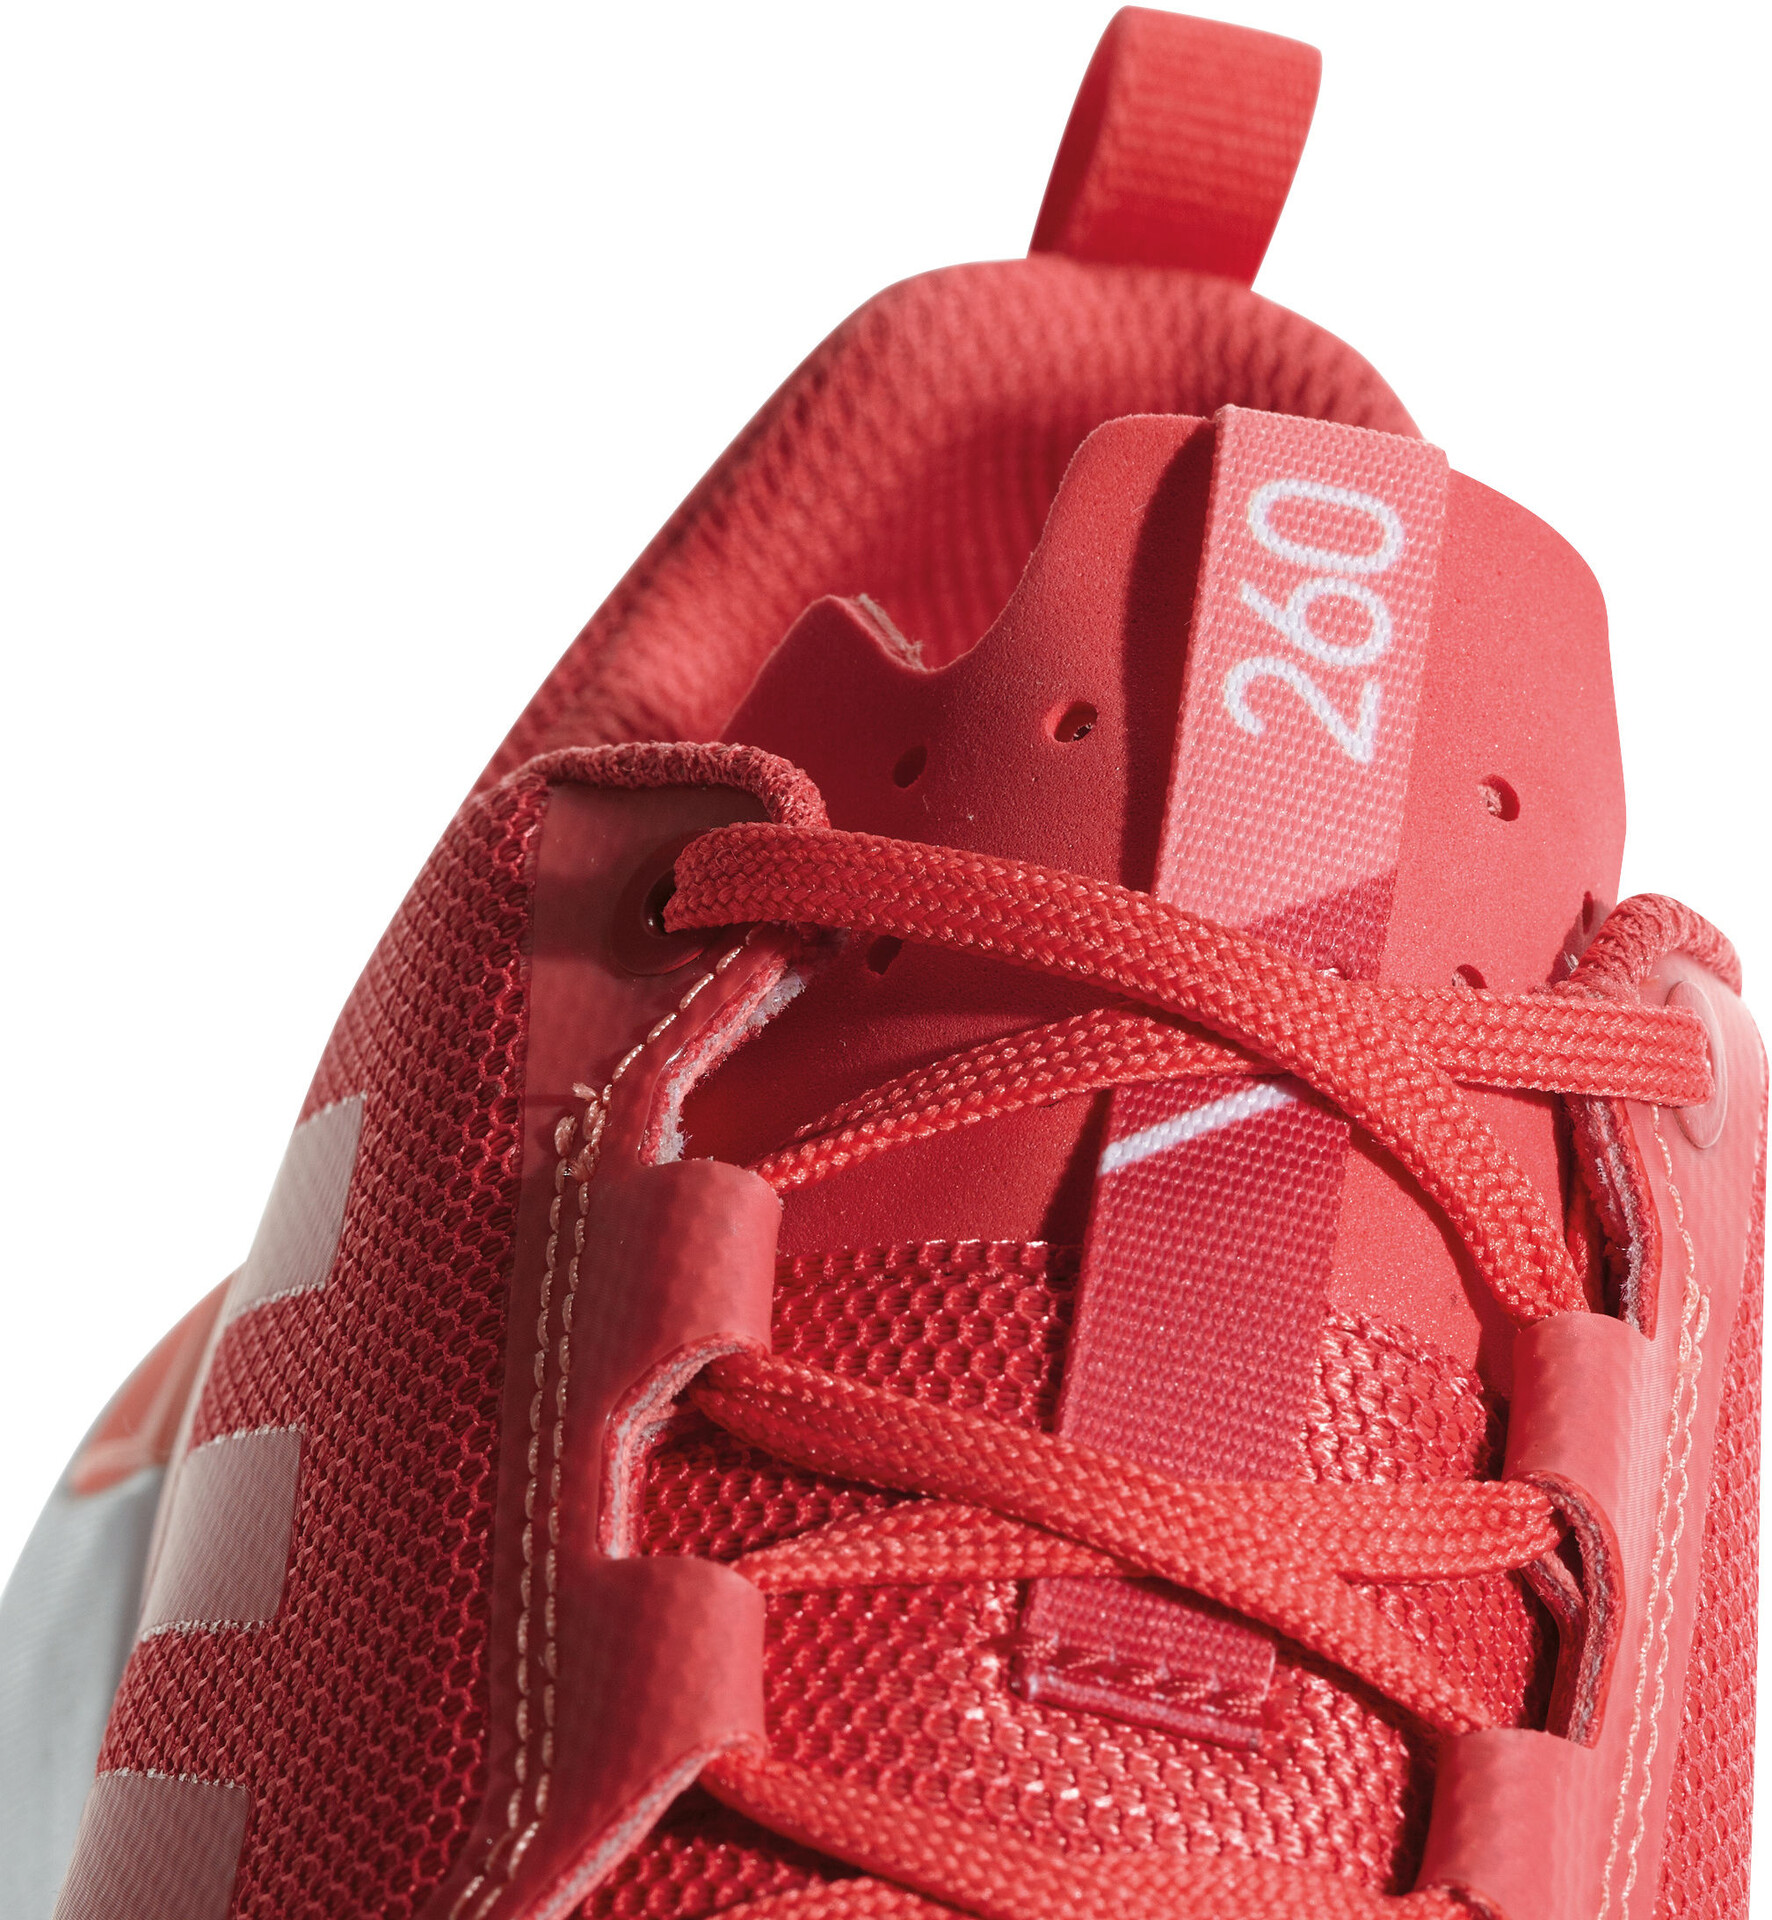 Terrex Sur Adidas Femme Cmtk Rose Chaussures Running paqaxwOd4